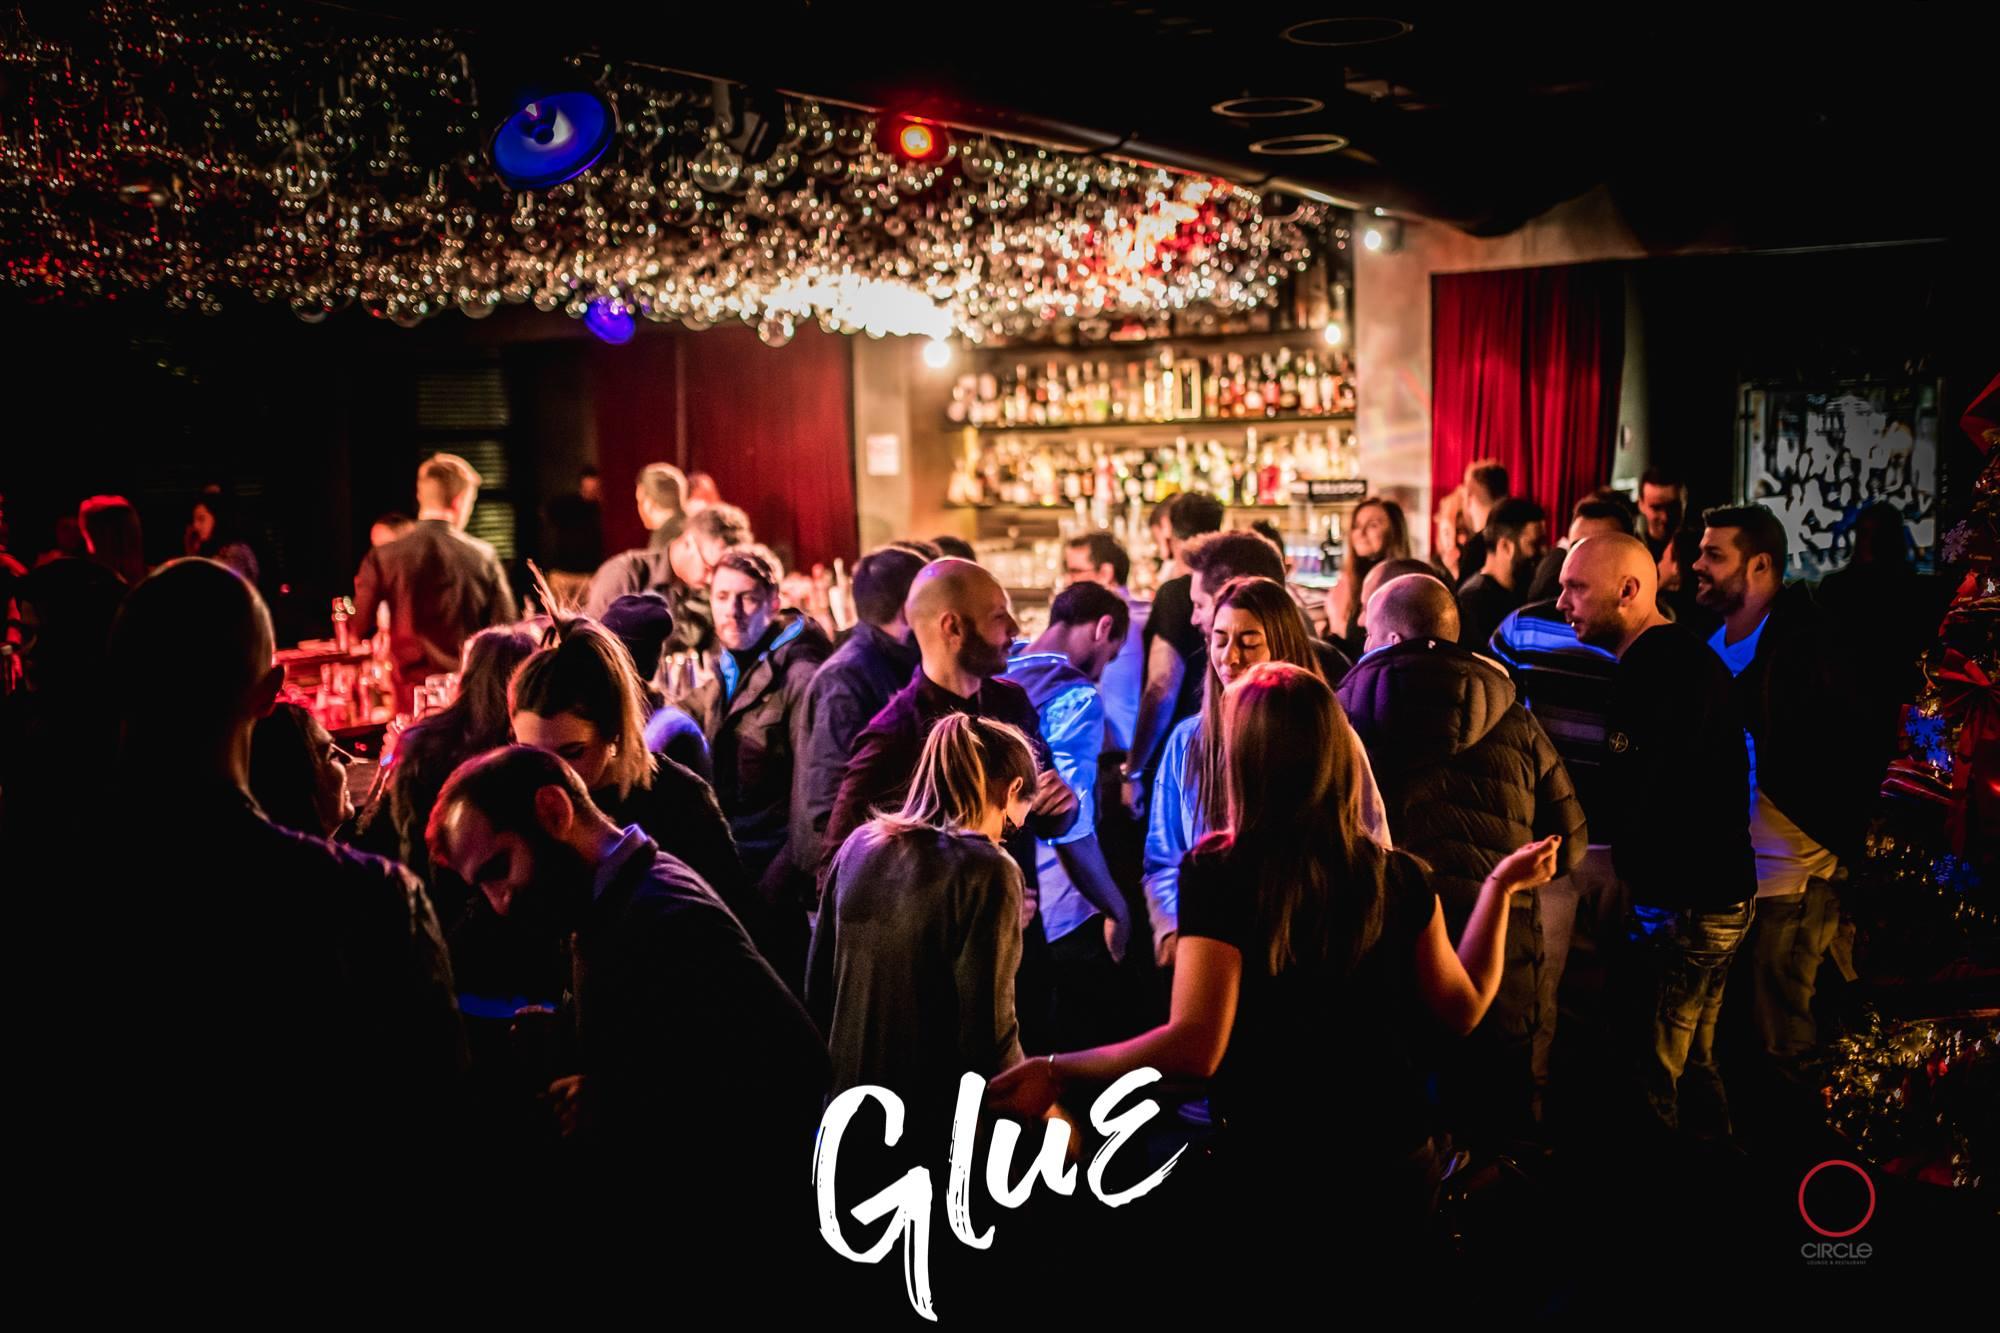 Glue / House Culture Alex De Ponti | YOUparti circle friday free house music